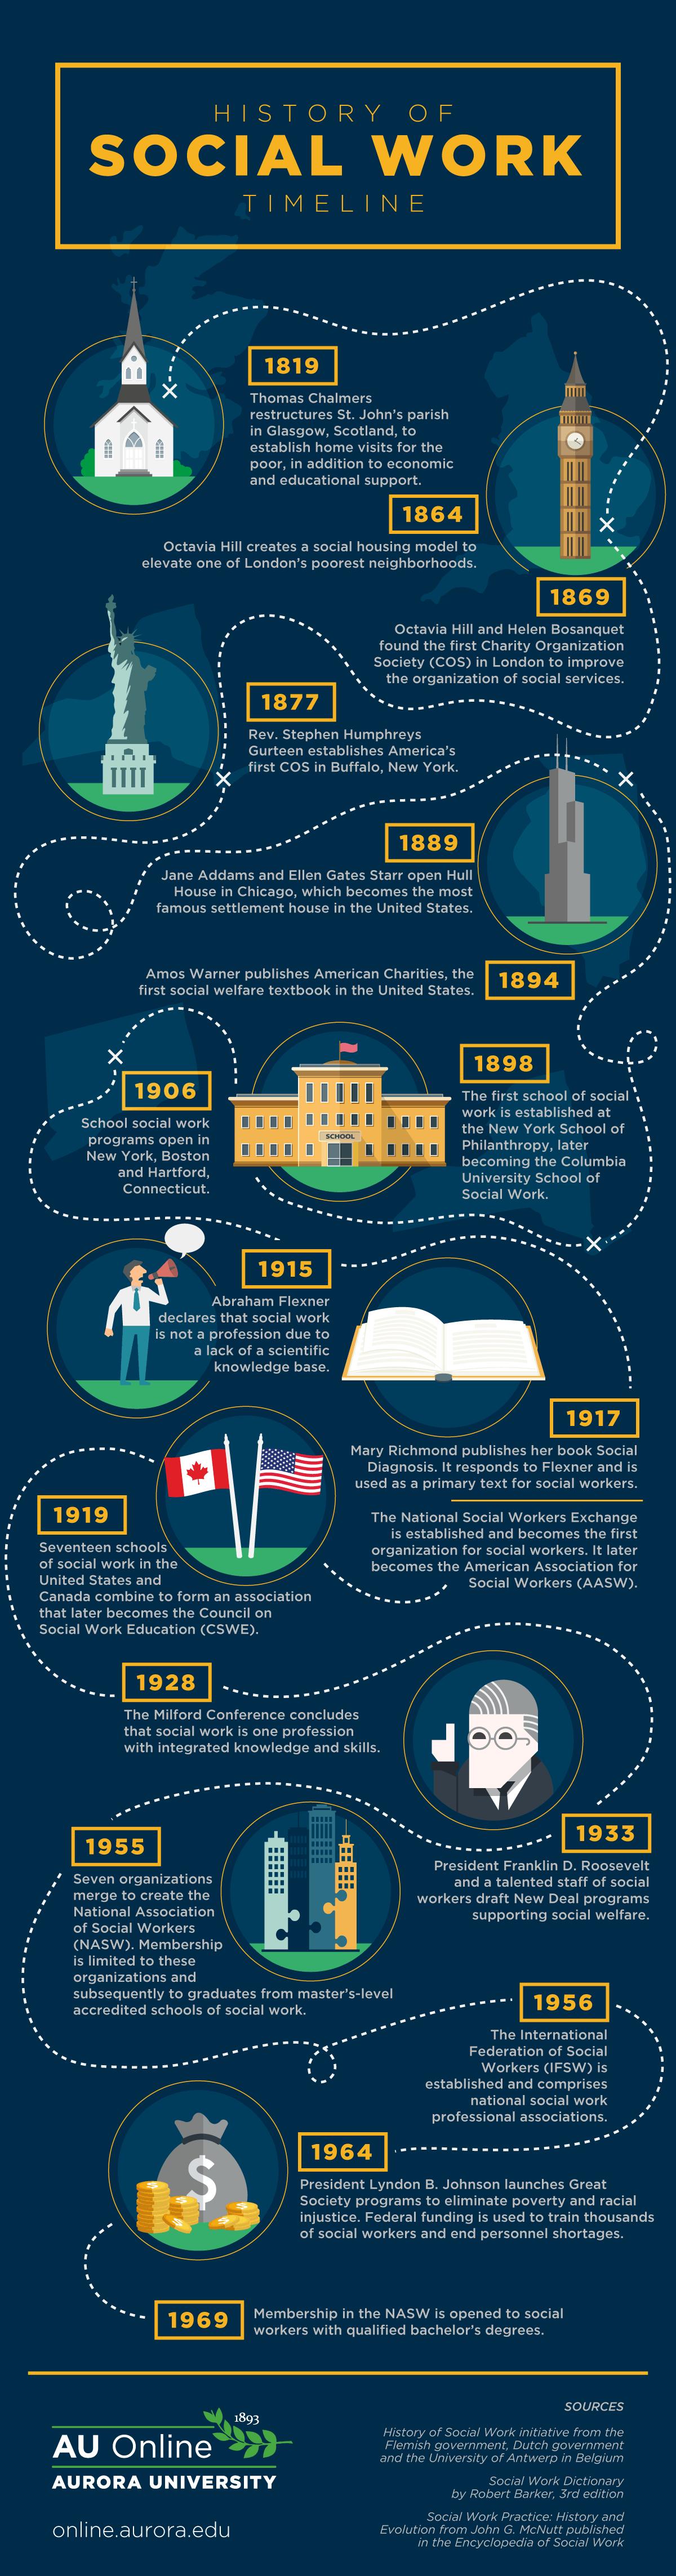 History of Social Work Timeline